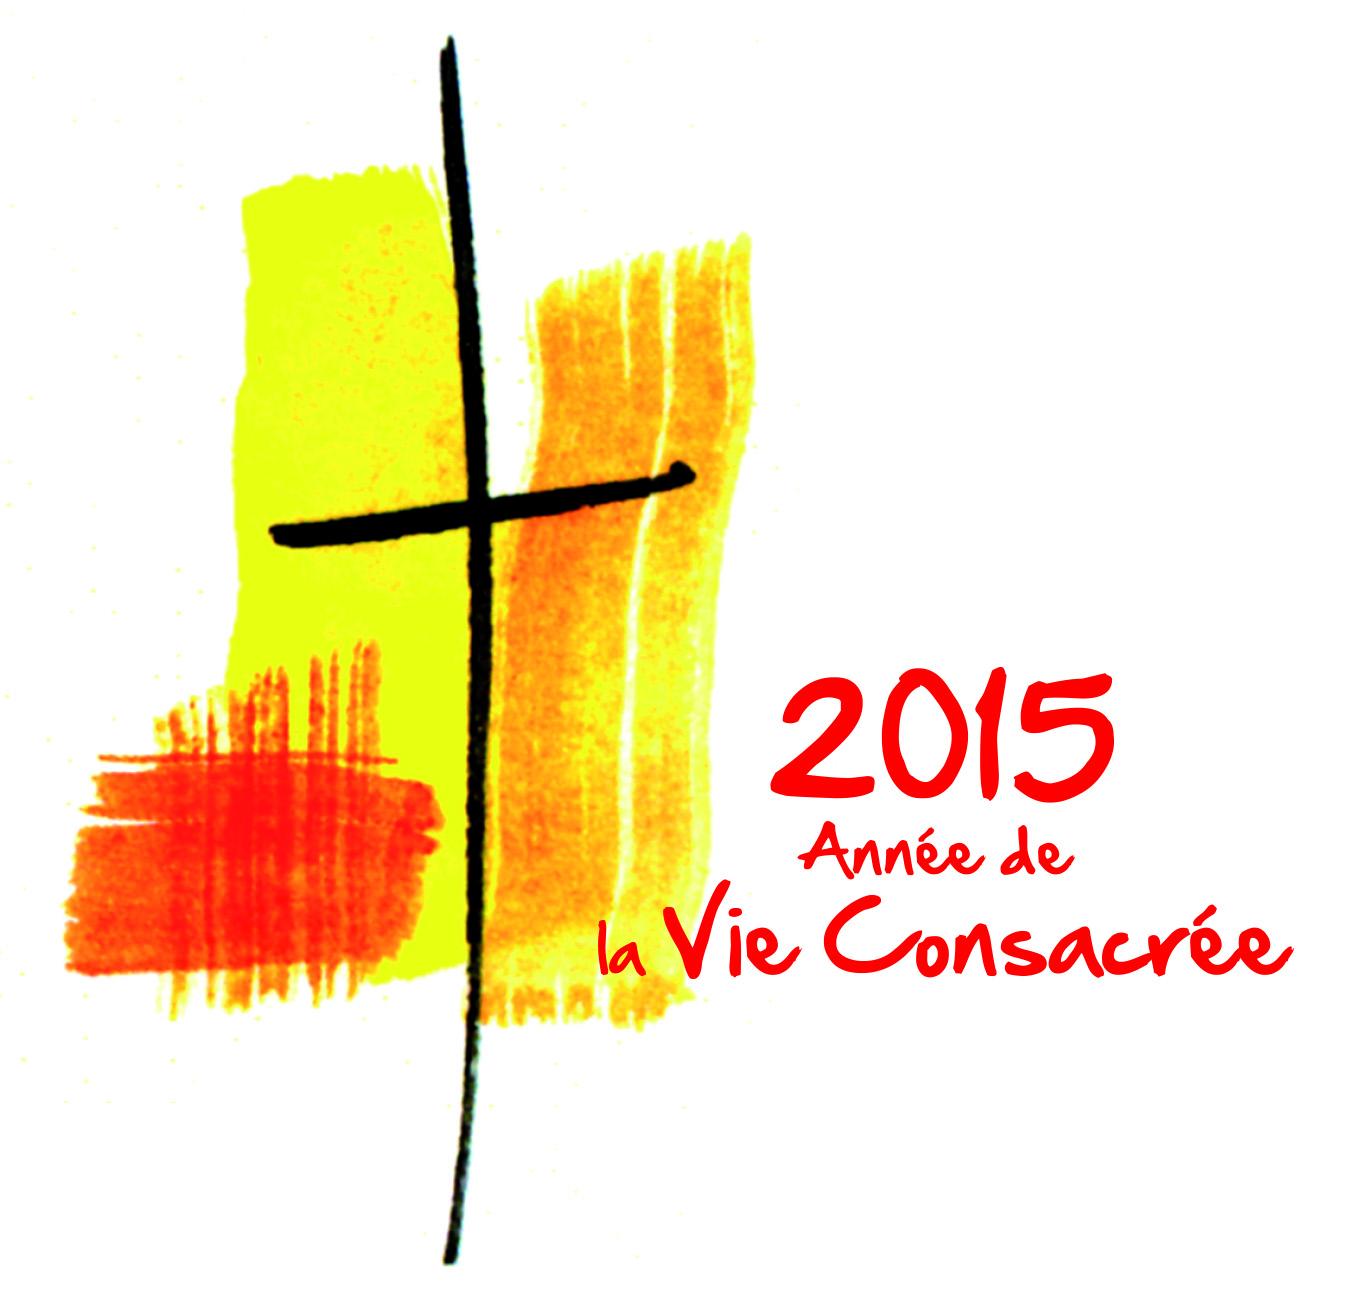 vie consacrée 2015